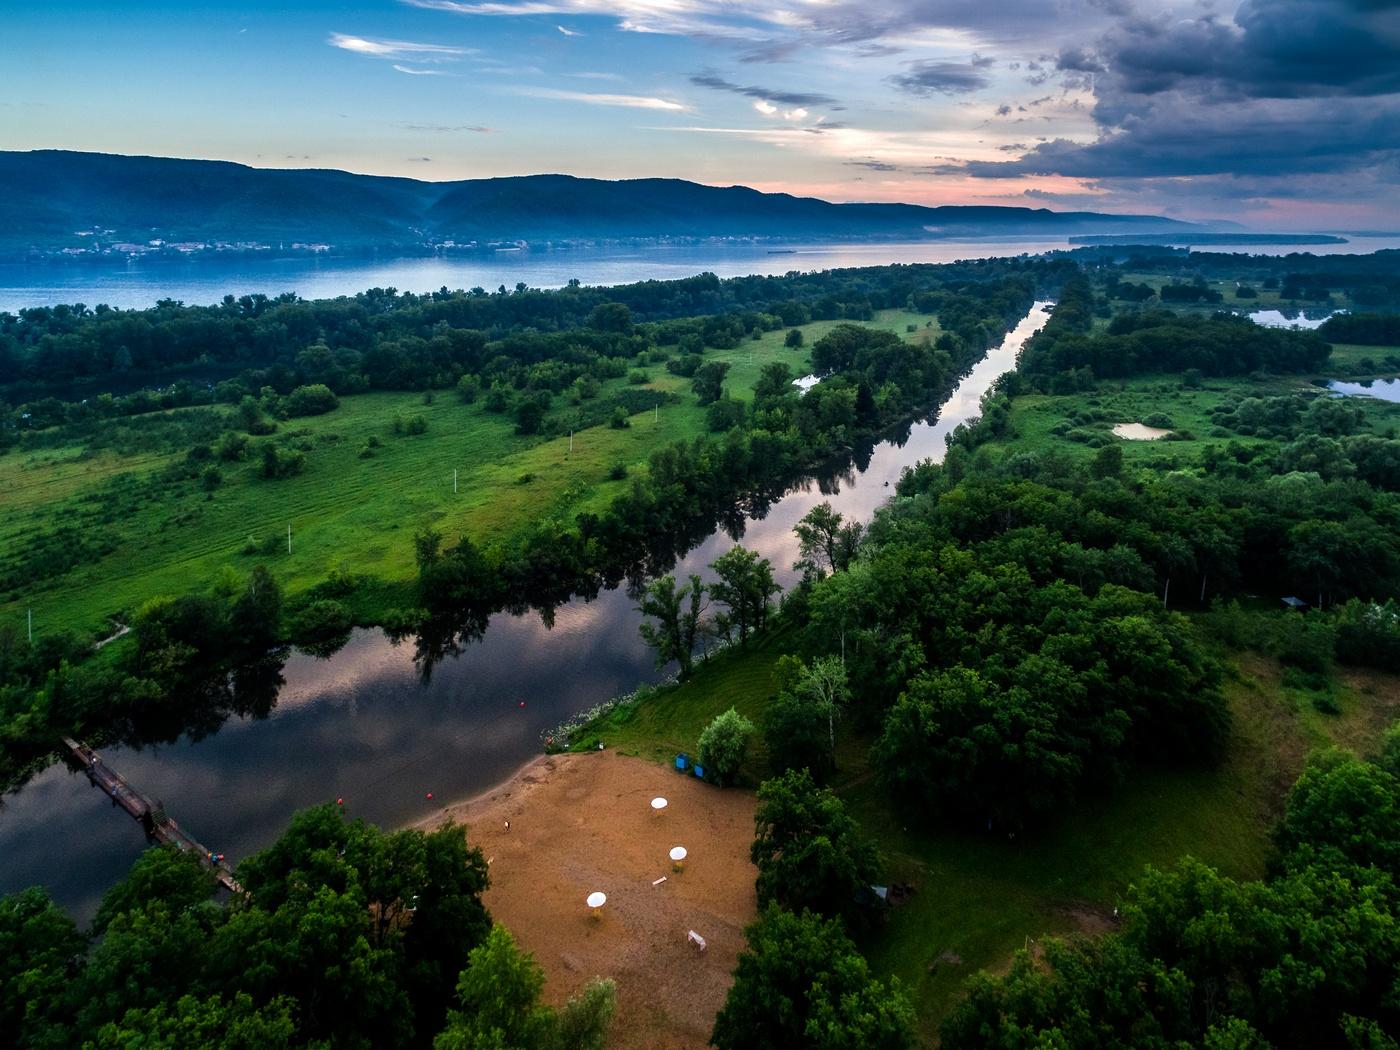 Картинки природы самарской области